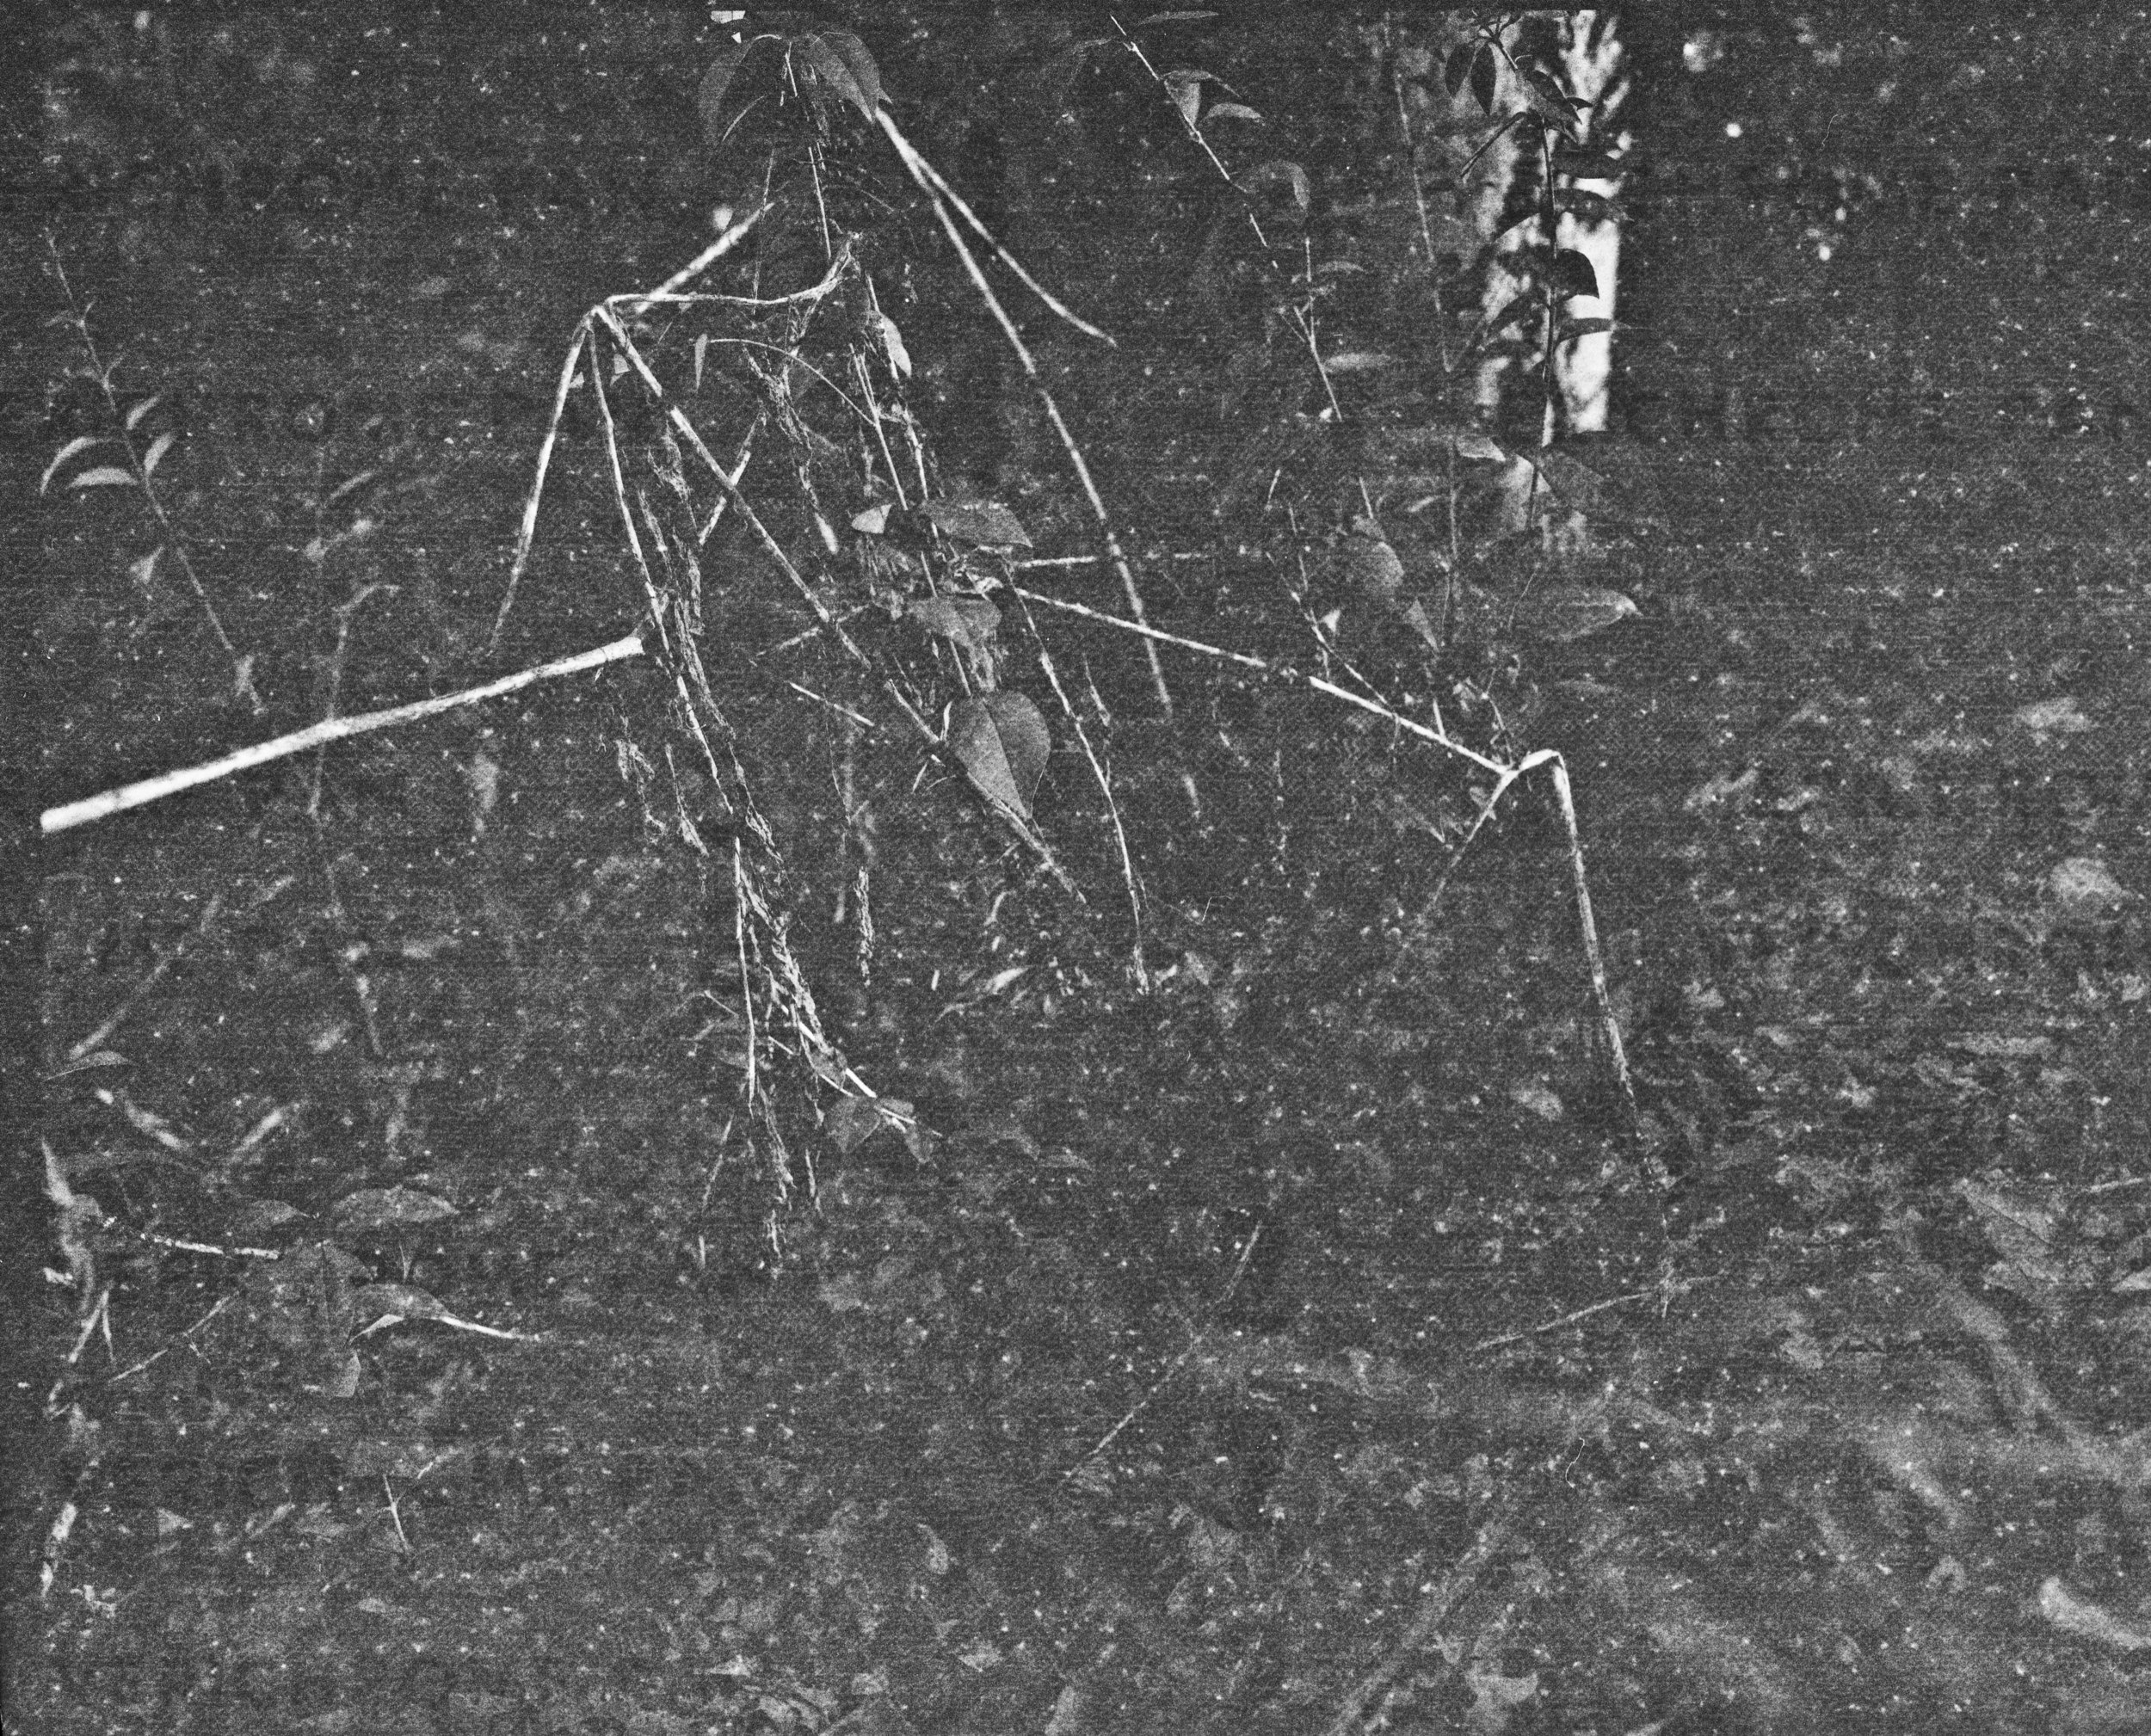 lydiasee-creekoffspringdale2014-color120mm-batch141.JPG